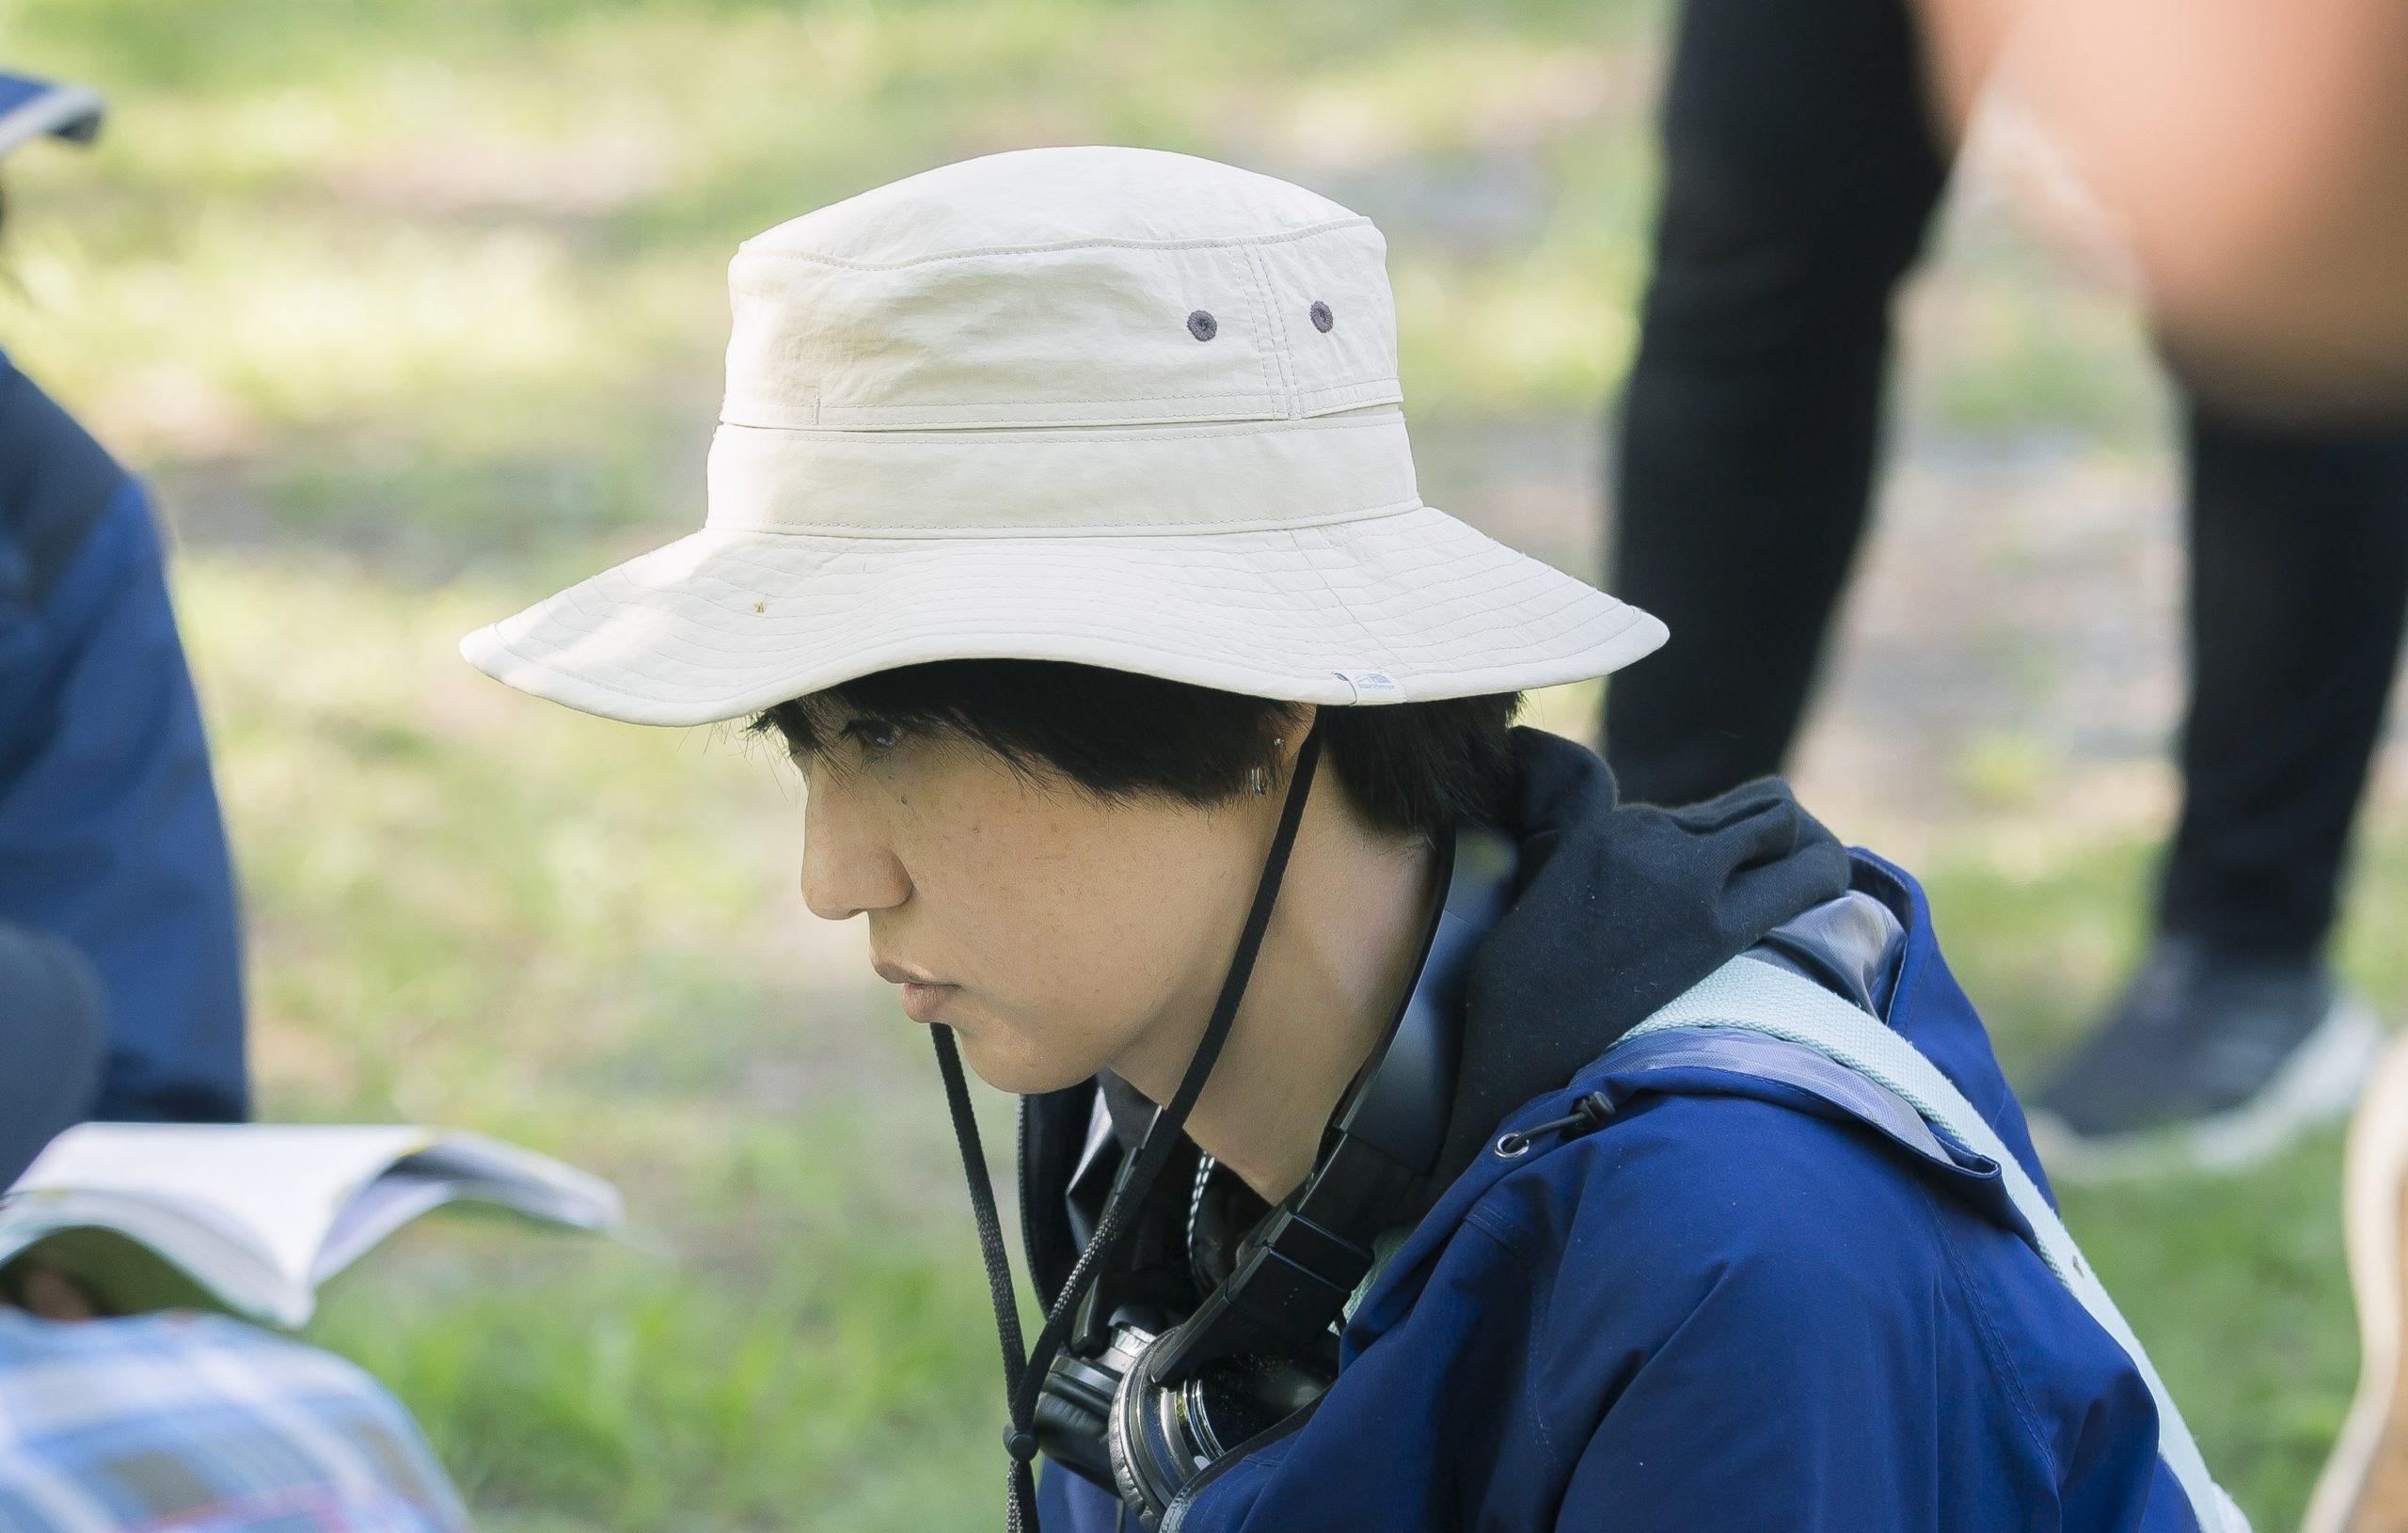 Director, Satoko YOKOHAMA